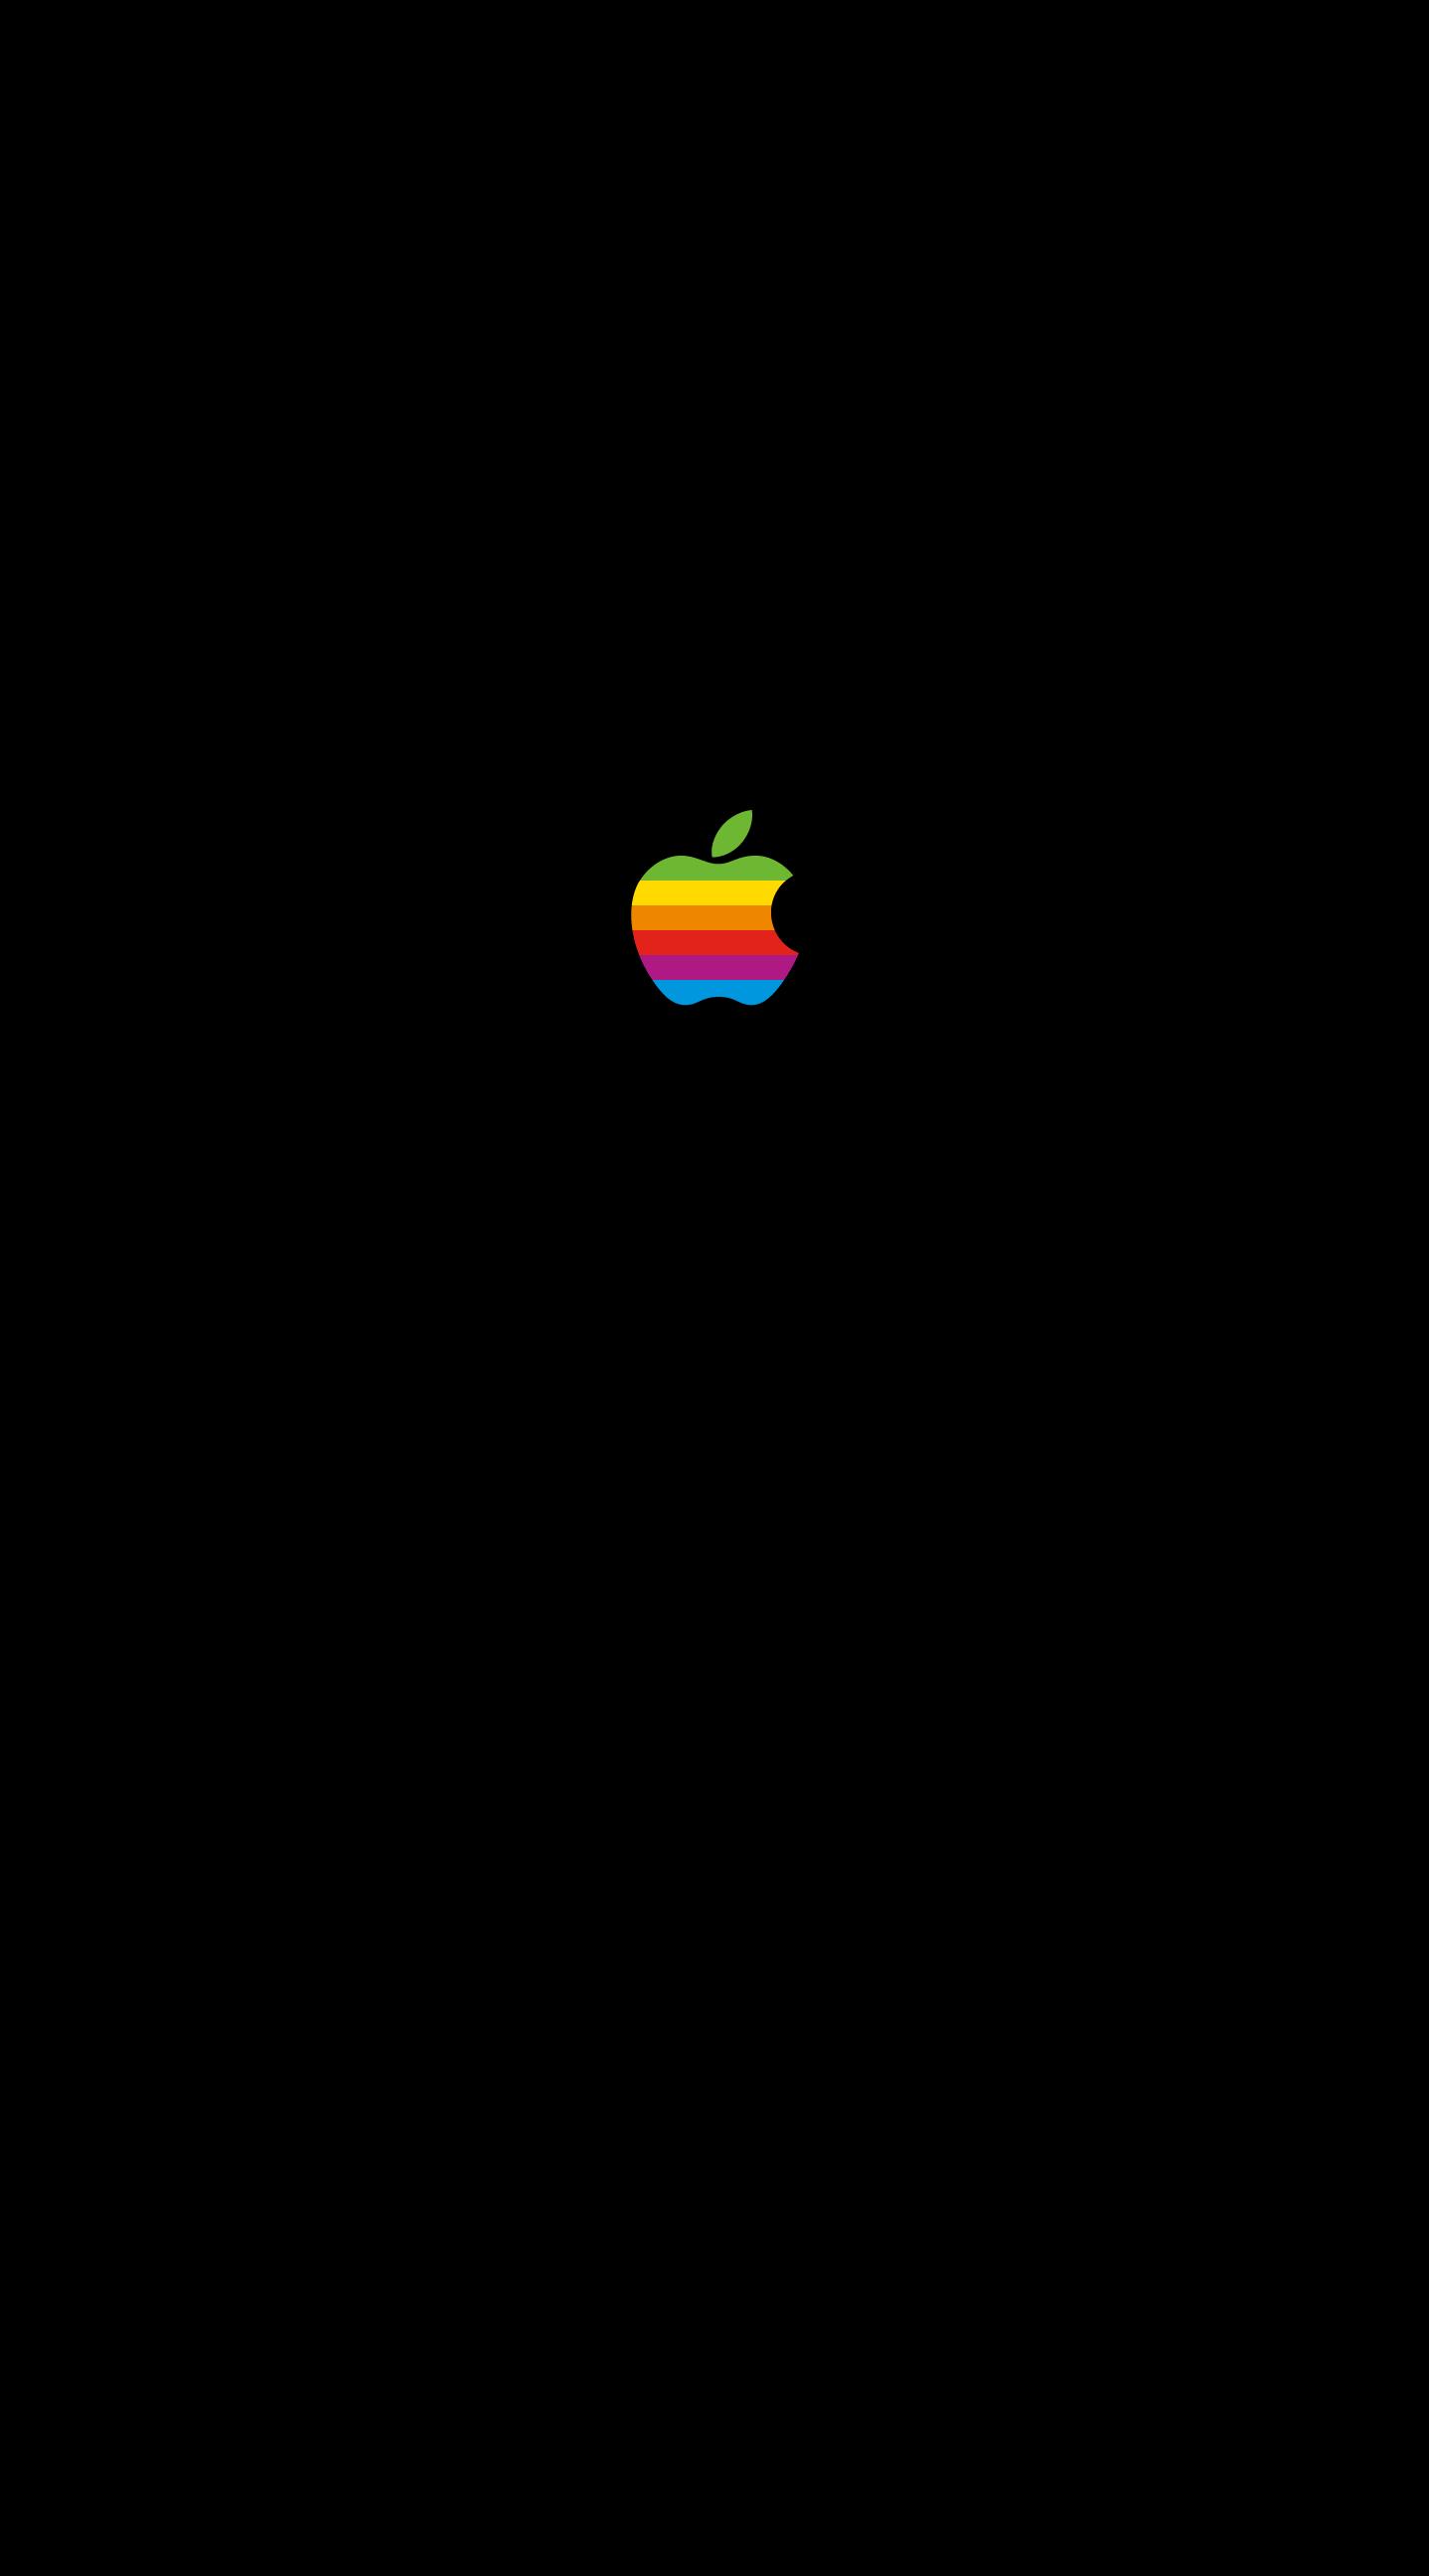 Appleレインボー壁紙 iPad, iPhone Plus(縦横) (9:16)